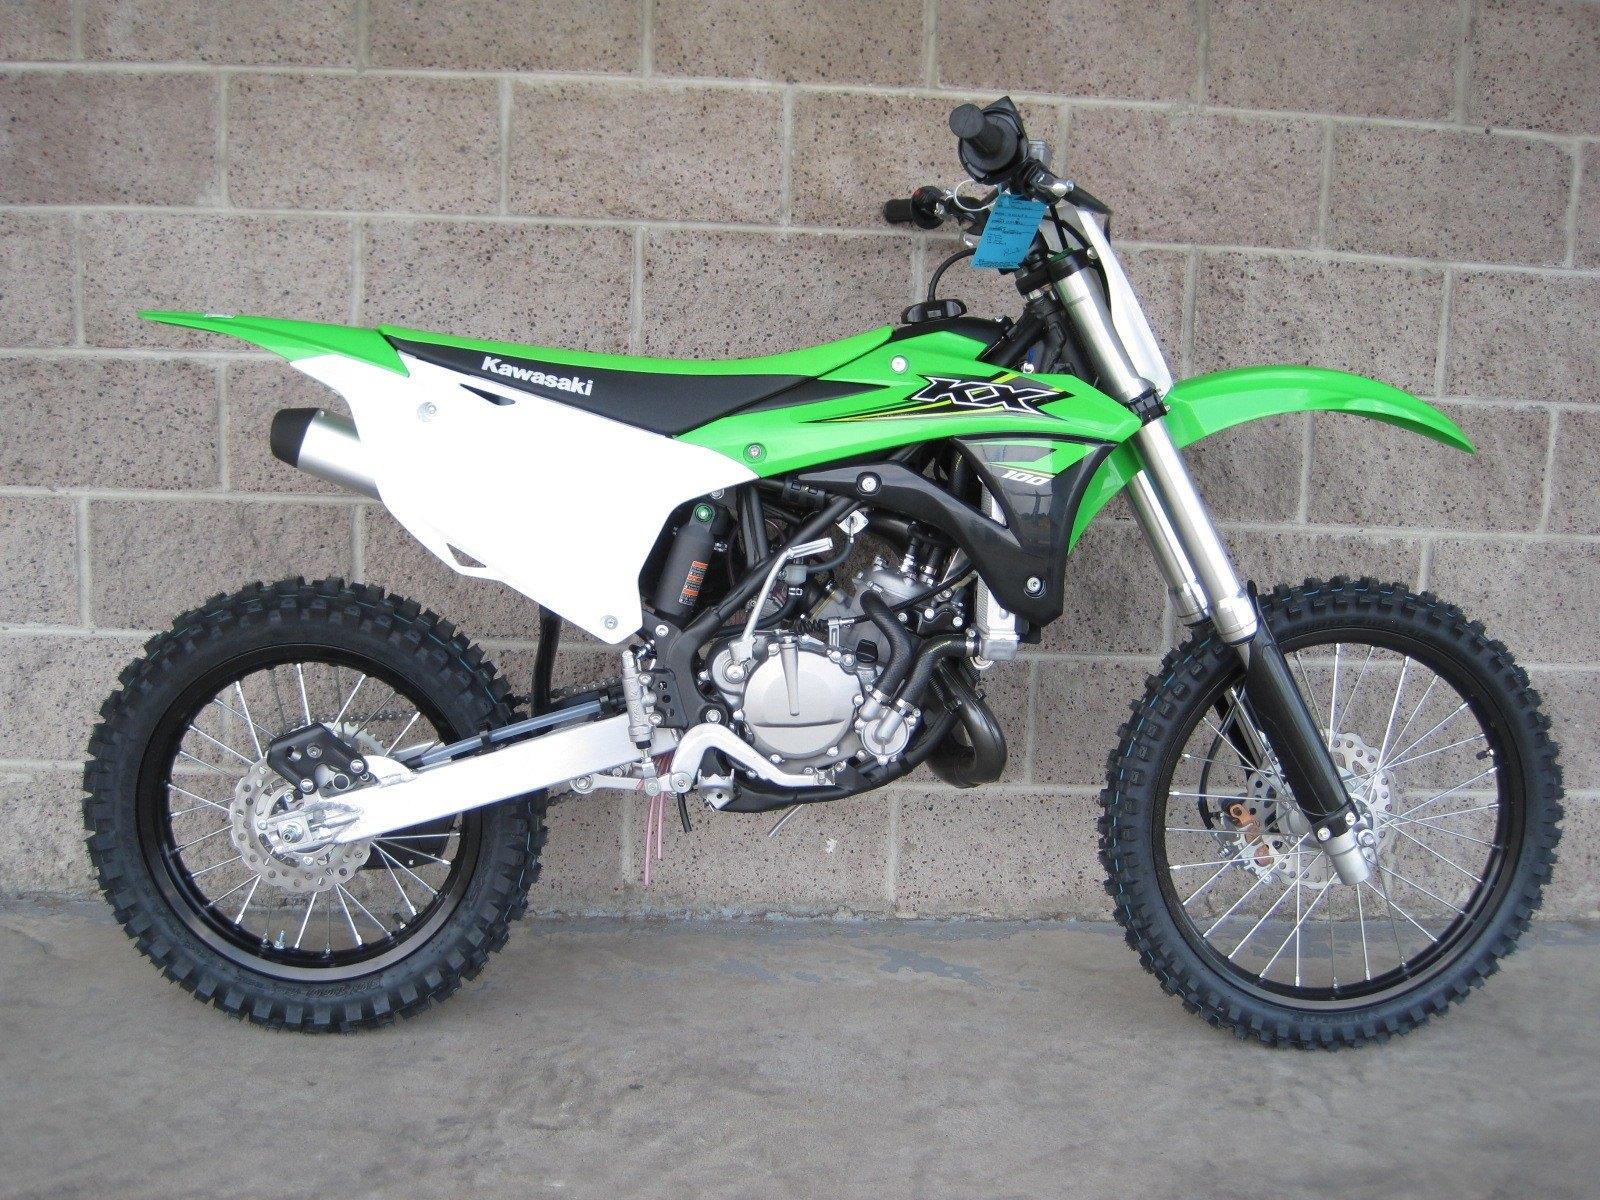 2017 Kawasaki KX100 in Denver, Colorado